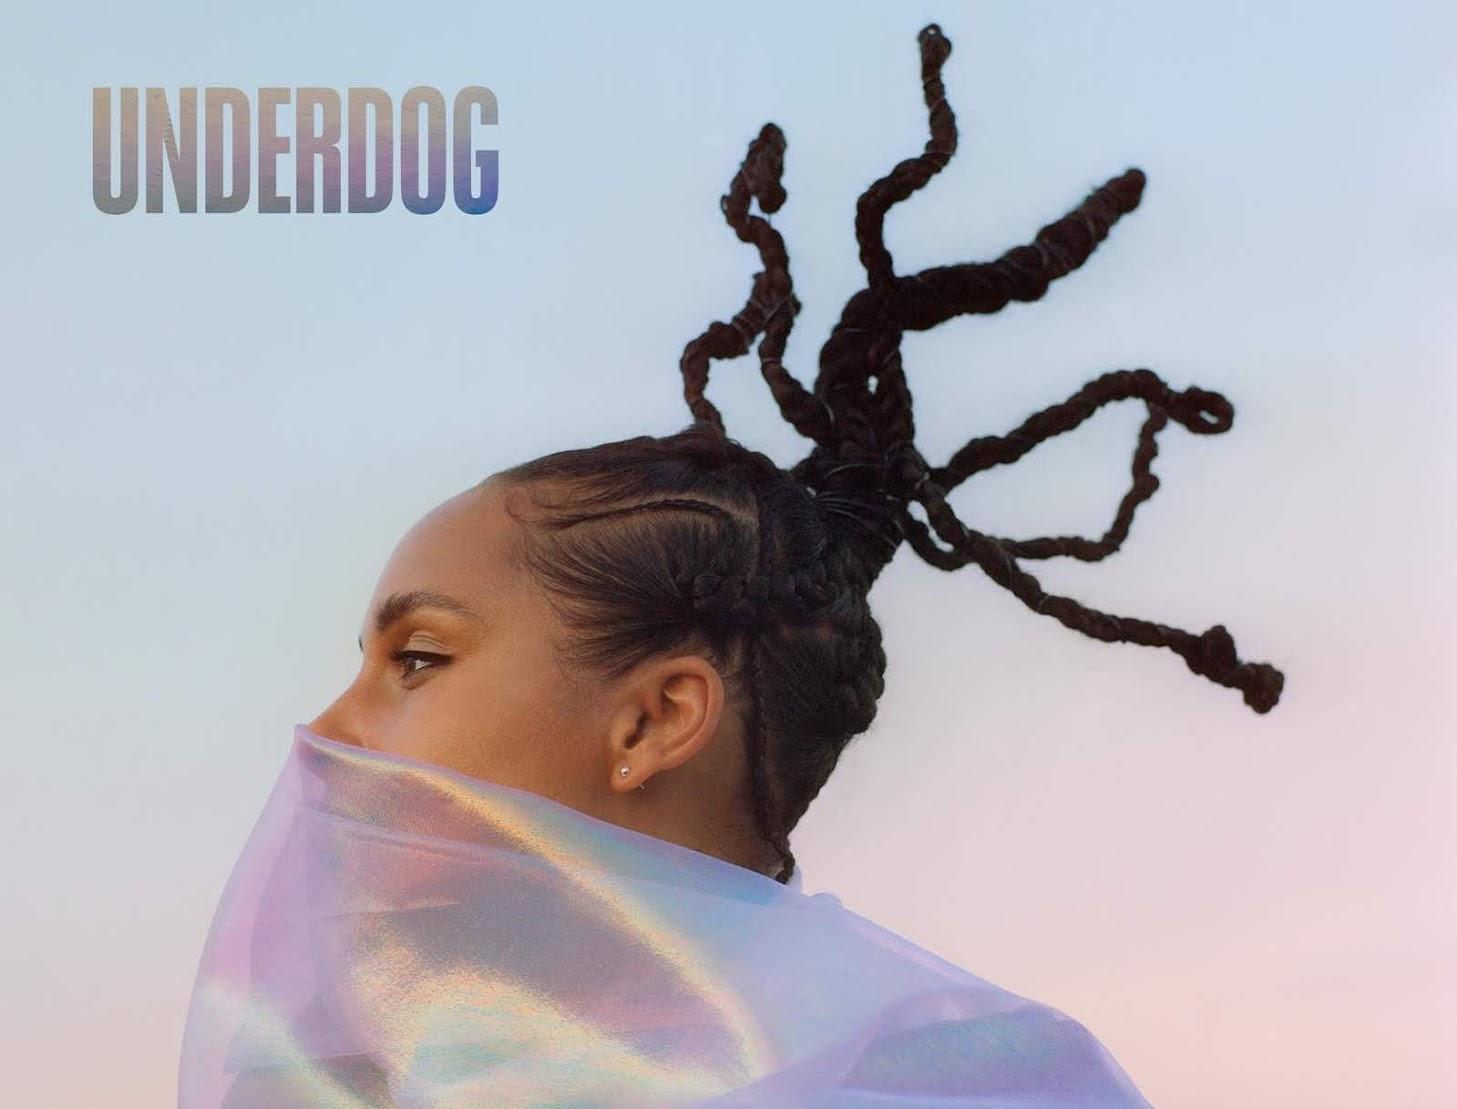 Alicia Keys 新單曲〈Underdog〉出爐 歌詞正面鼓舞人心